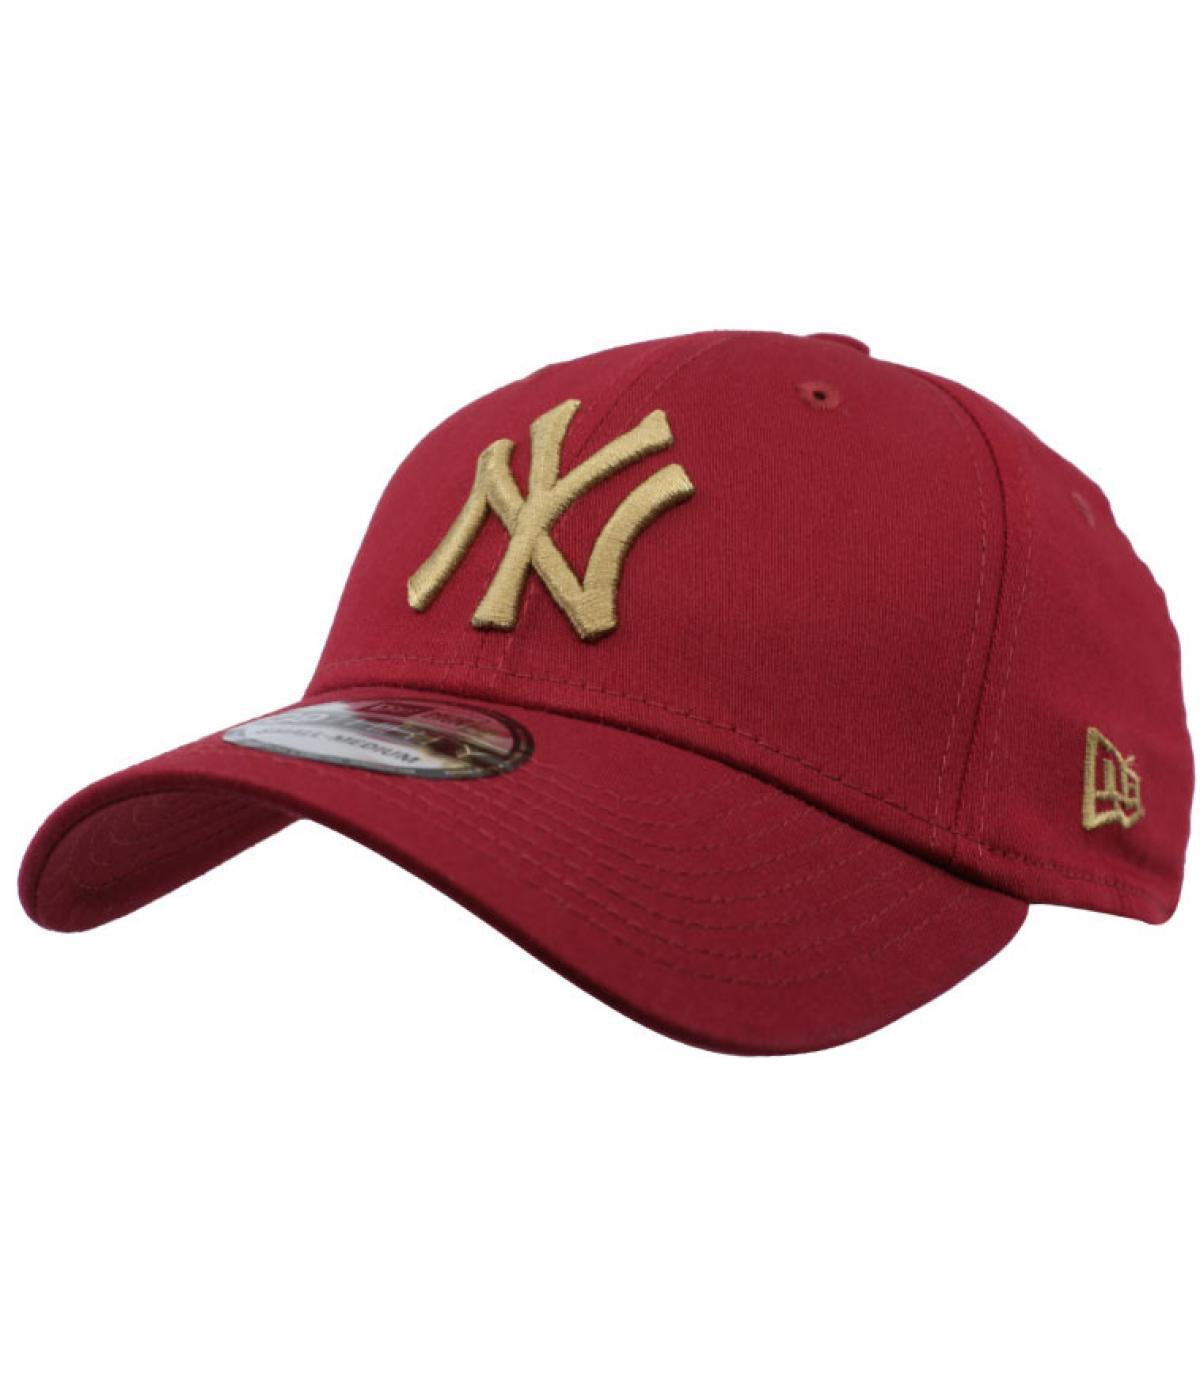 Details Cap League Ess NY 3930 cardinal wheat - Abbildung 2